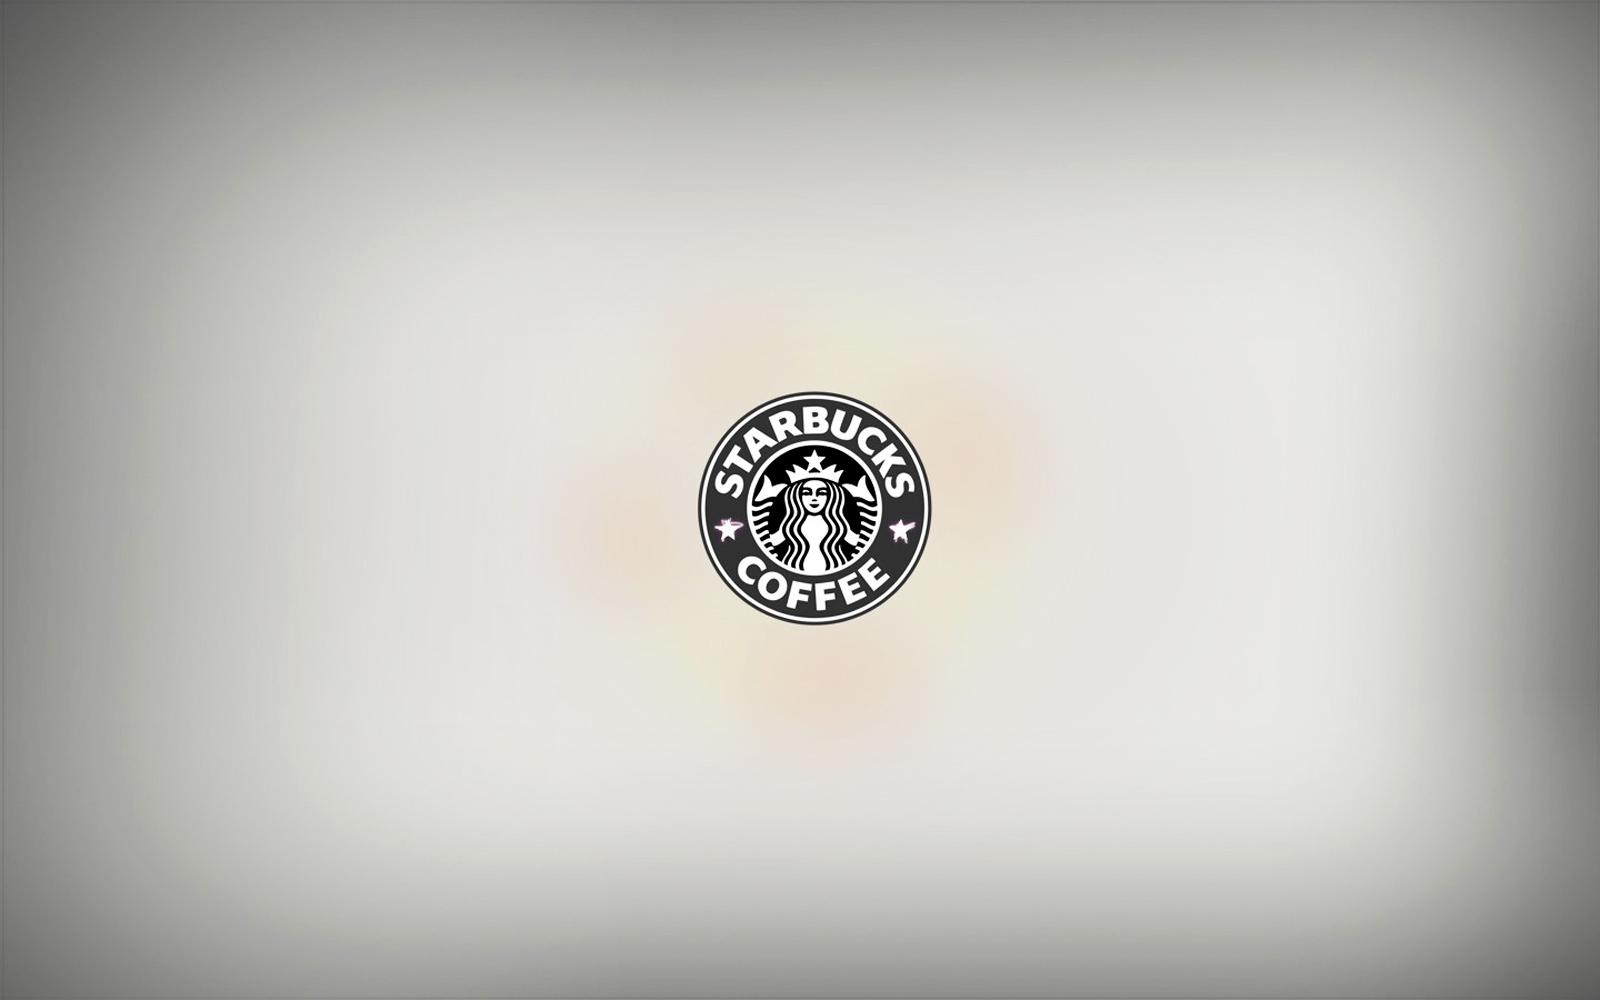 starbucks coffee logo hd wallpapers hd wallpapers